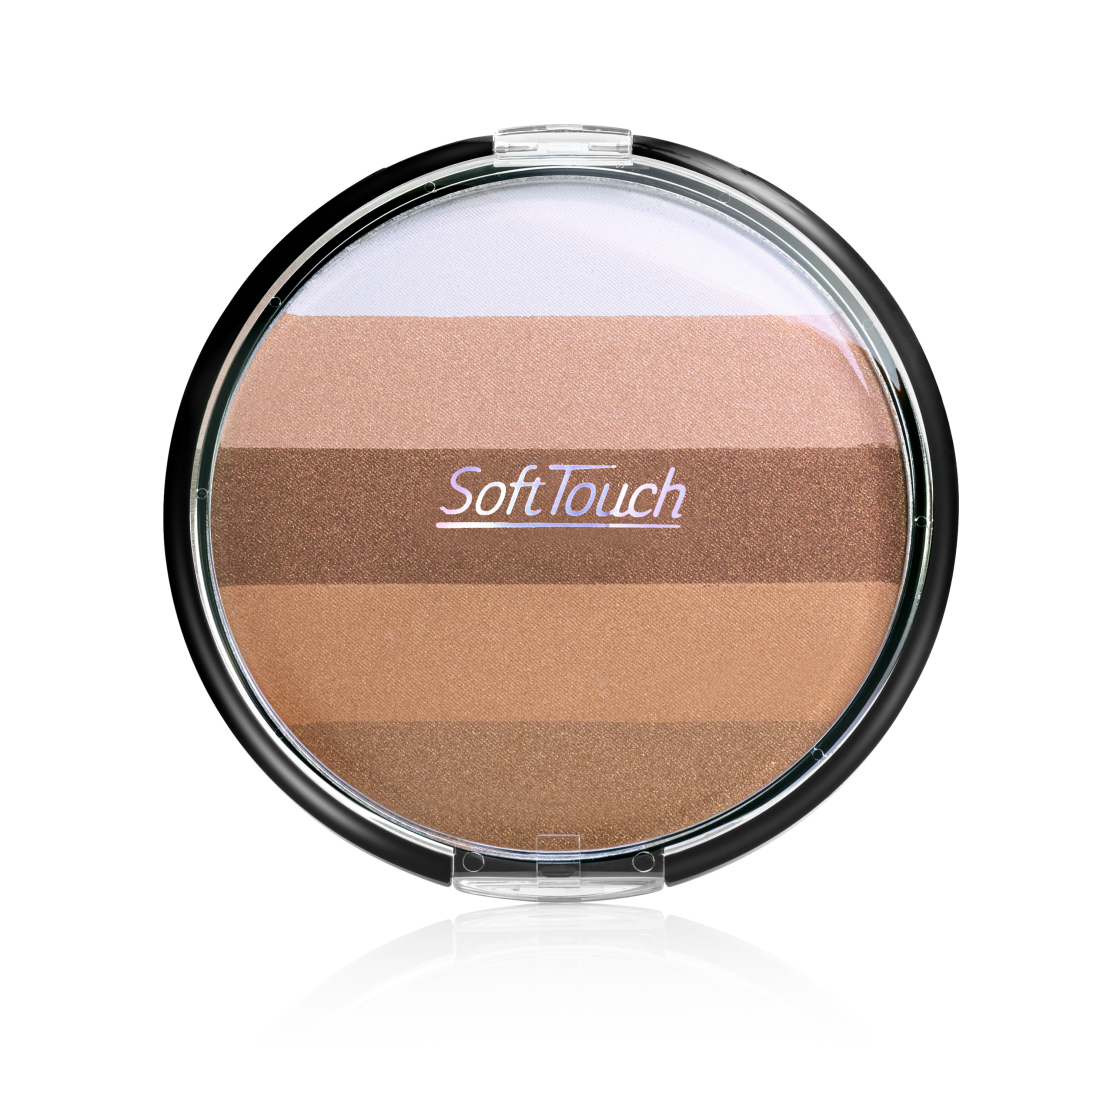 Soft Touch ברונזר בגודל ענק למראה זוהר  SUMMER PARTY , גוון 25